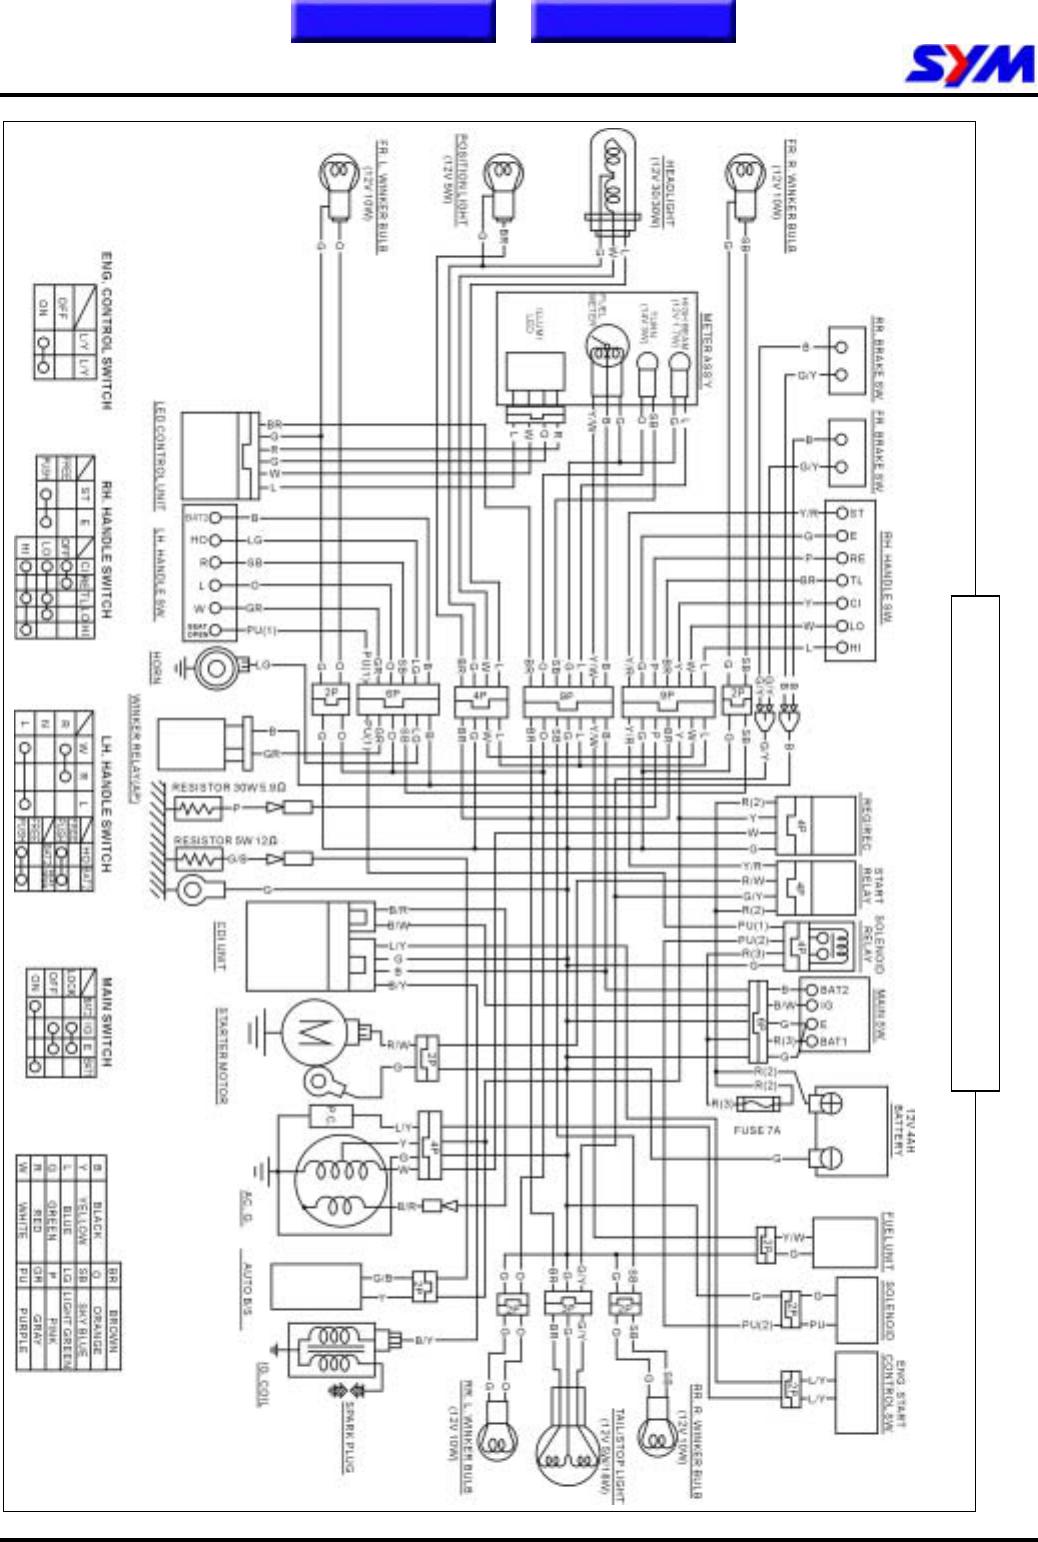 manual sym mio 50 (page 214 of 215) (english)  libble.eu